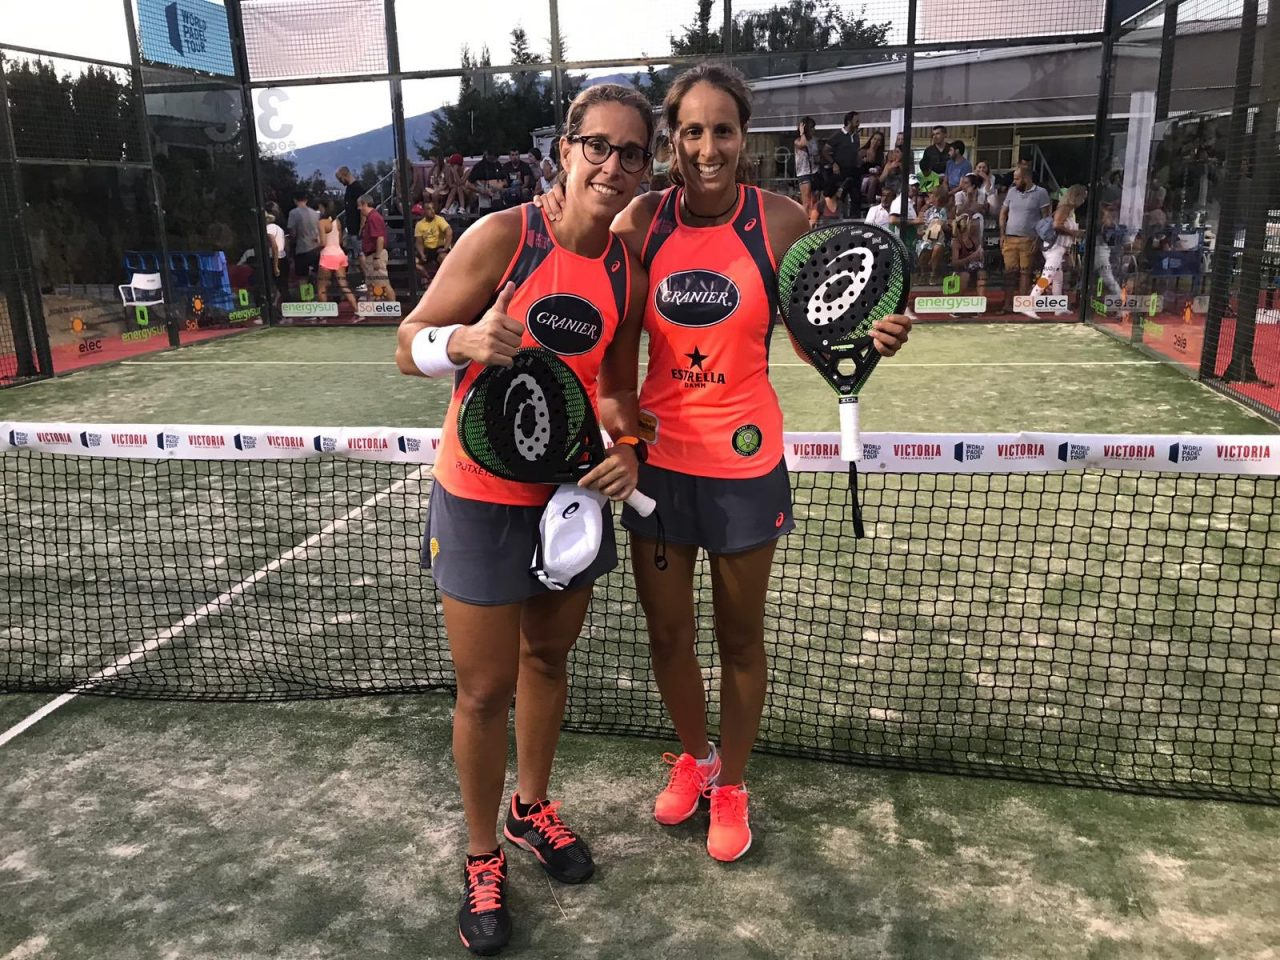 lucia-sainz-gemma-triay-octavos-femeninos-cervezas-victoria-mijas-open-2019